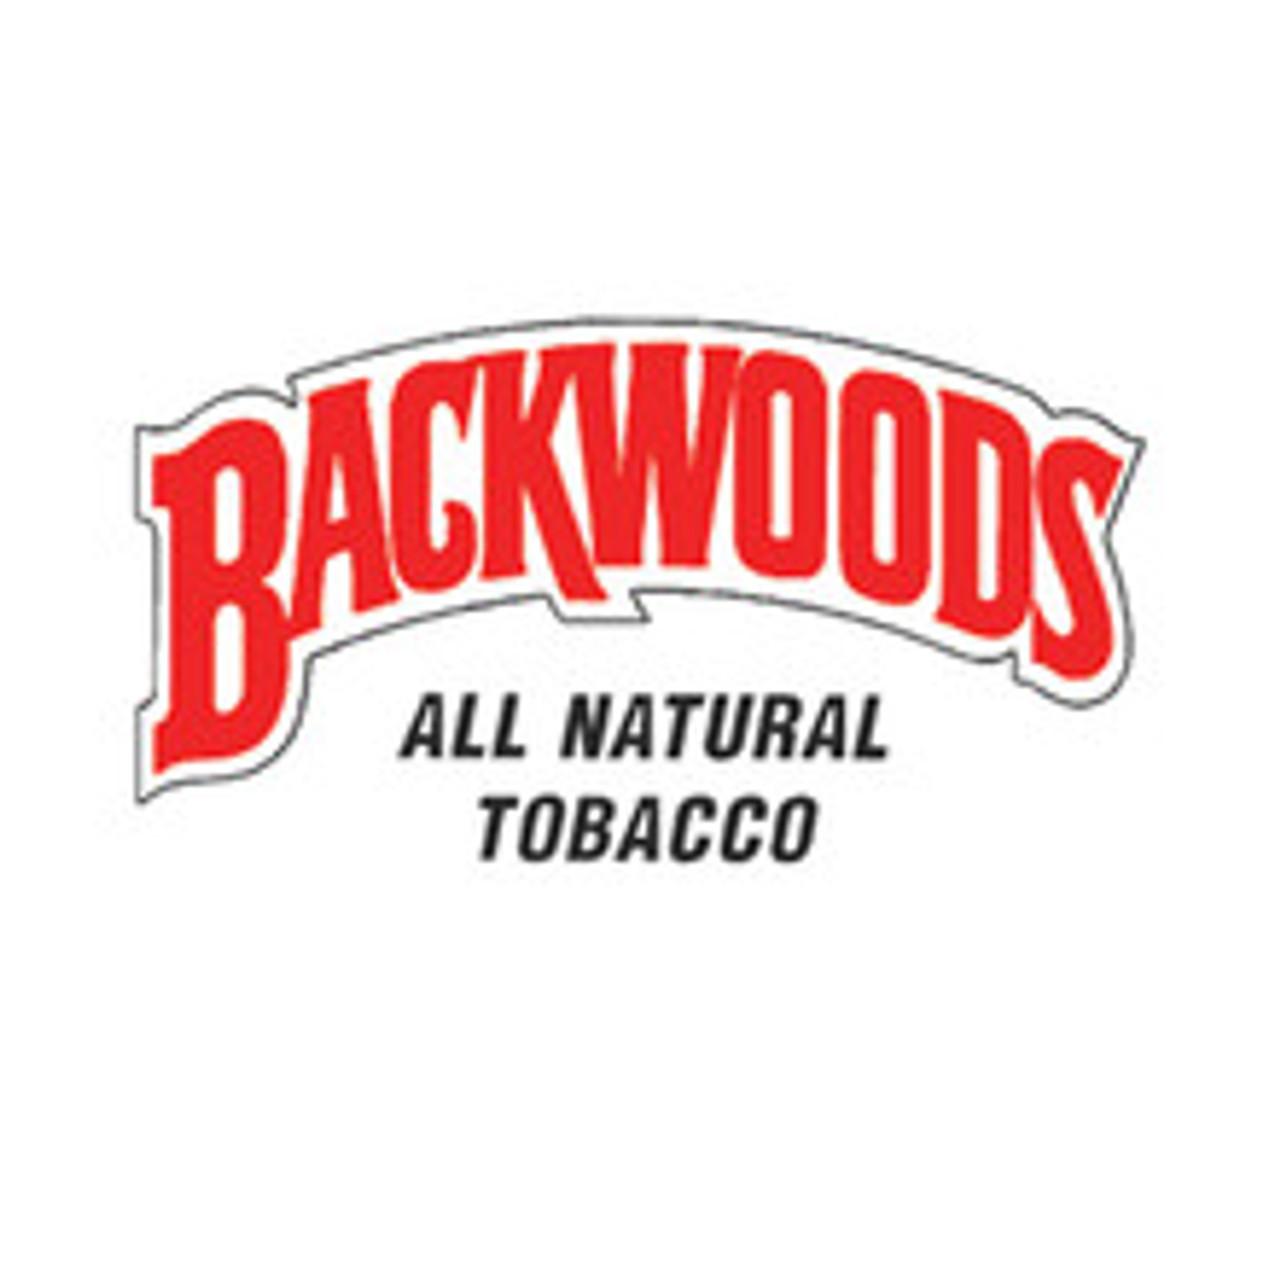 Backwoods Black Russian Cigars (8 Packs of 5) - Maduro